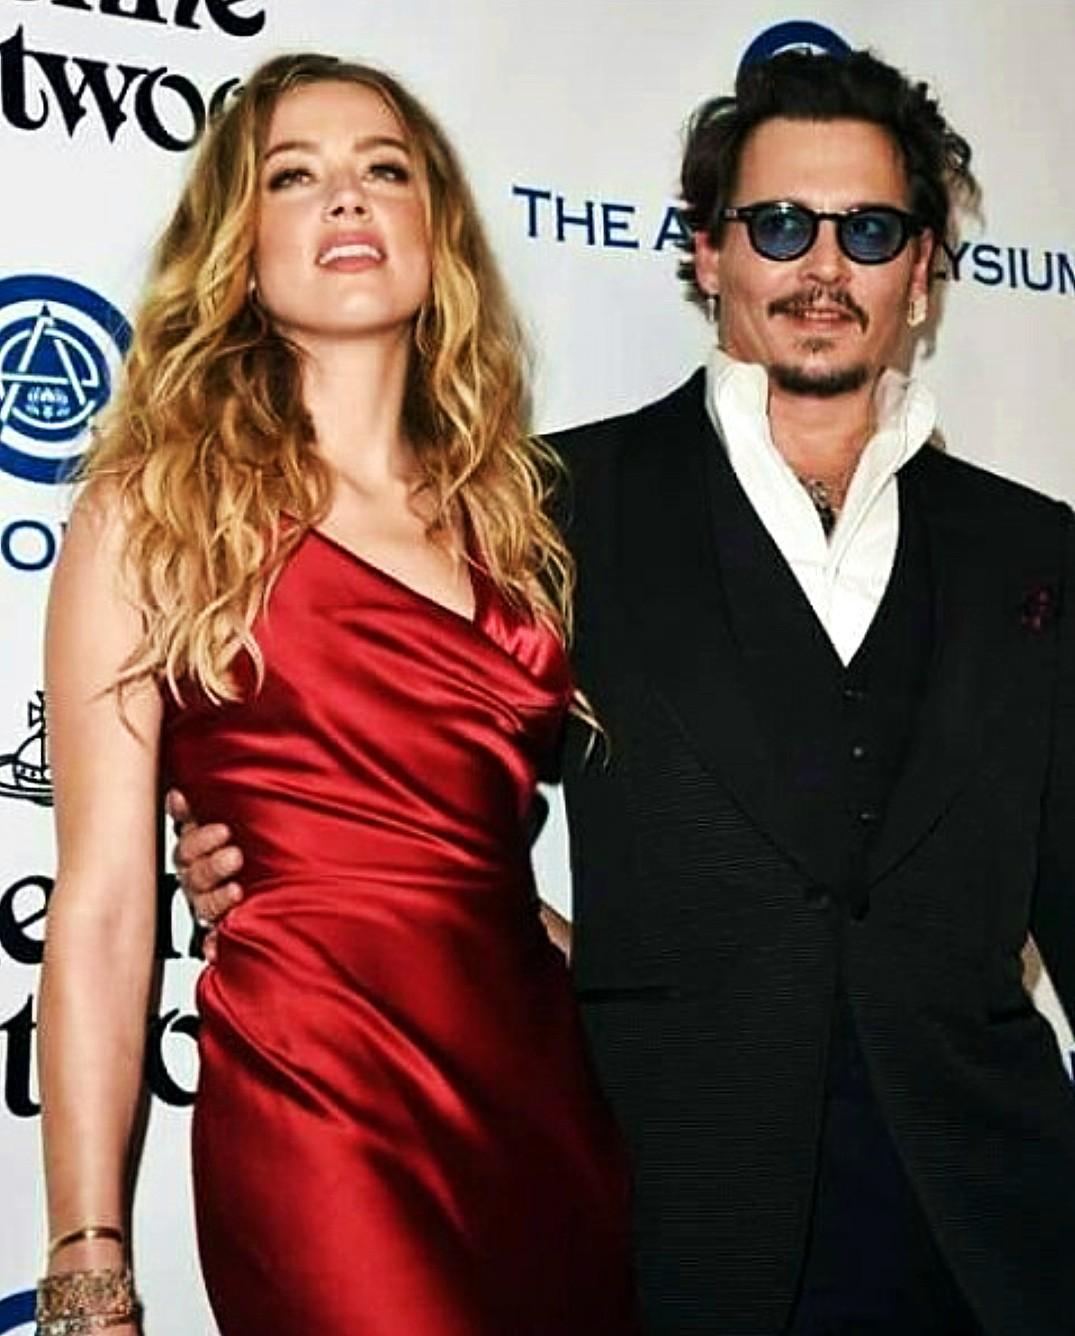 Golden Globes Art Elysium Johnny Depp, Amber Herd